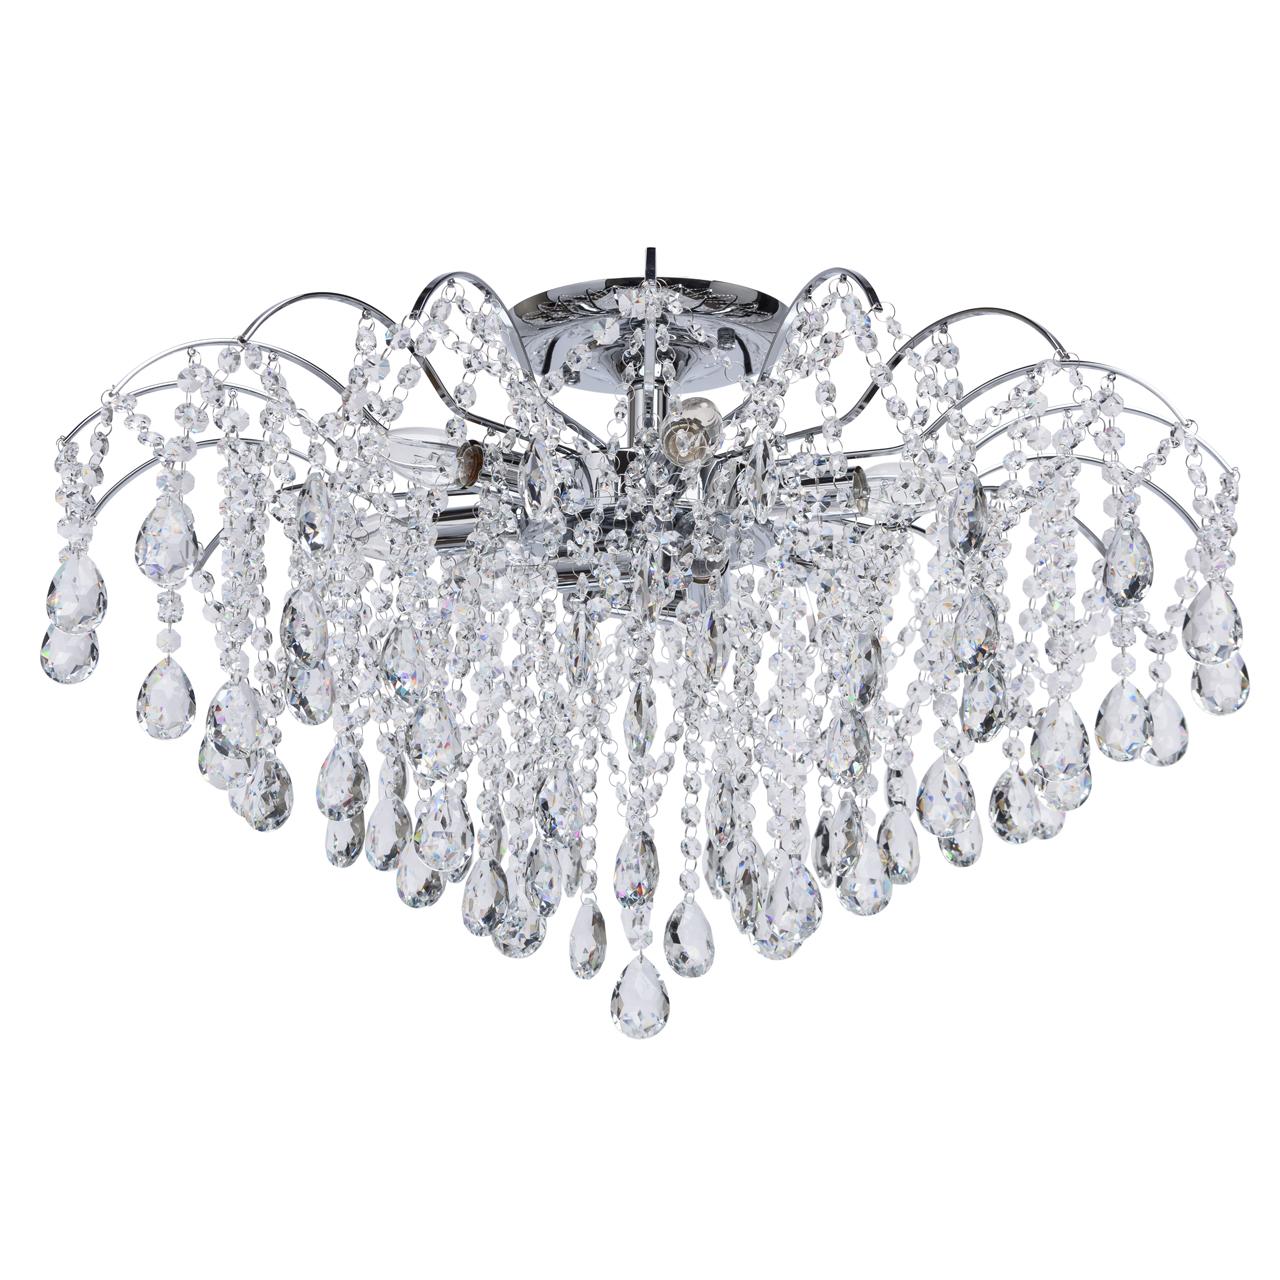 Светильник MW-Light 464018609, серебристый люстра mw light бриз 464018609